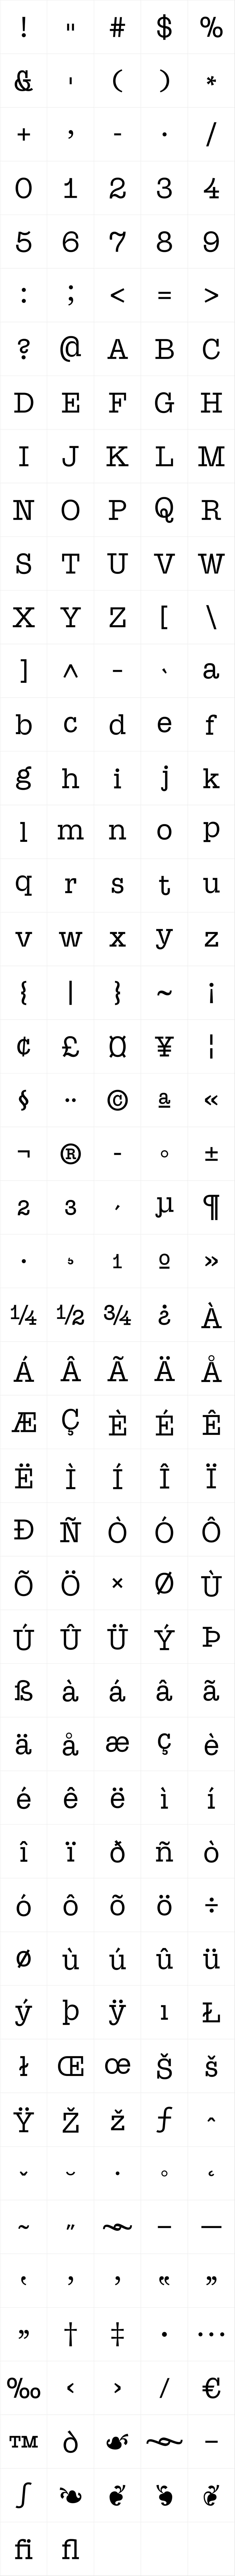 Suomi Slab Serif Book